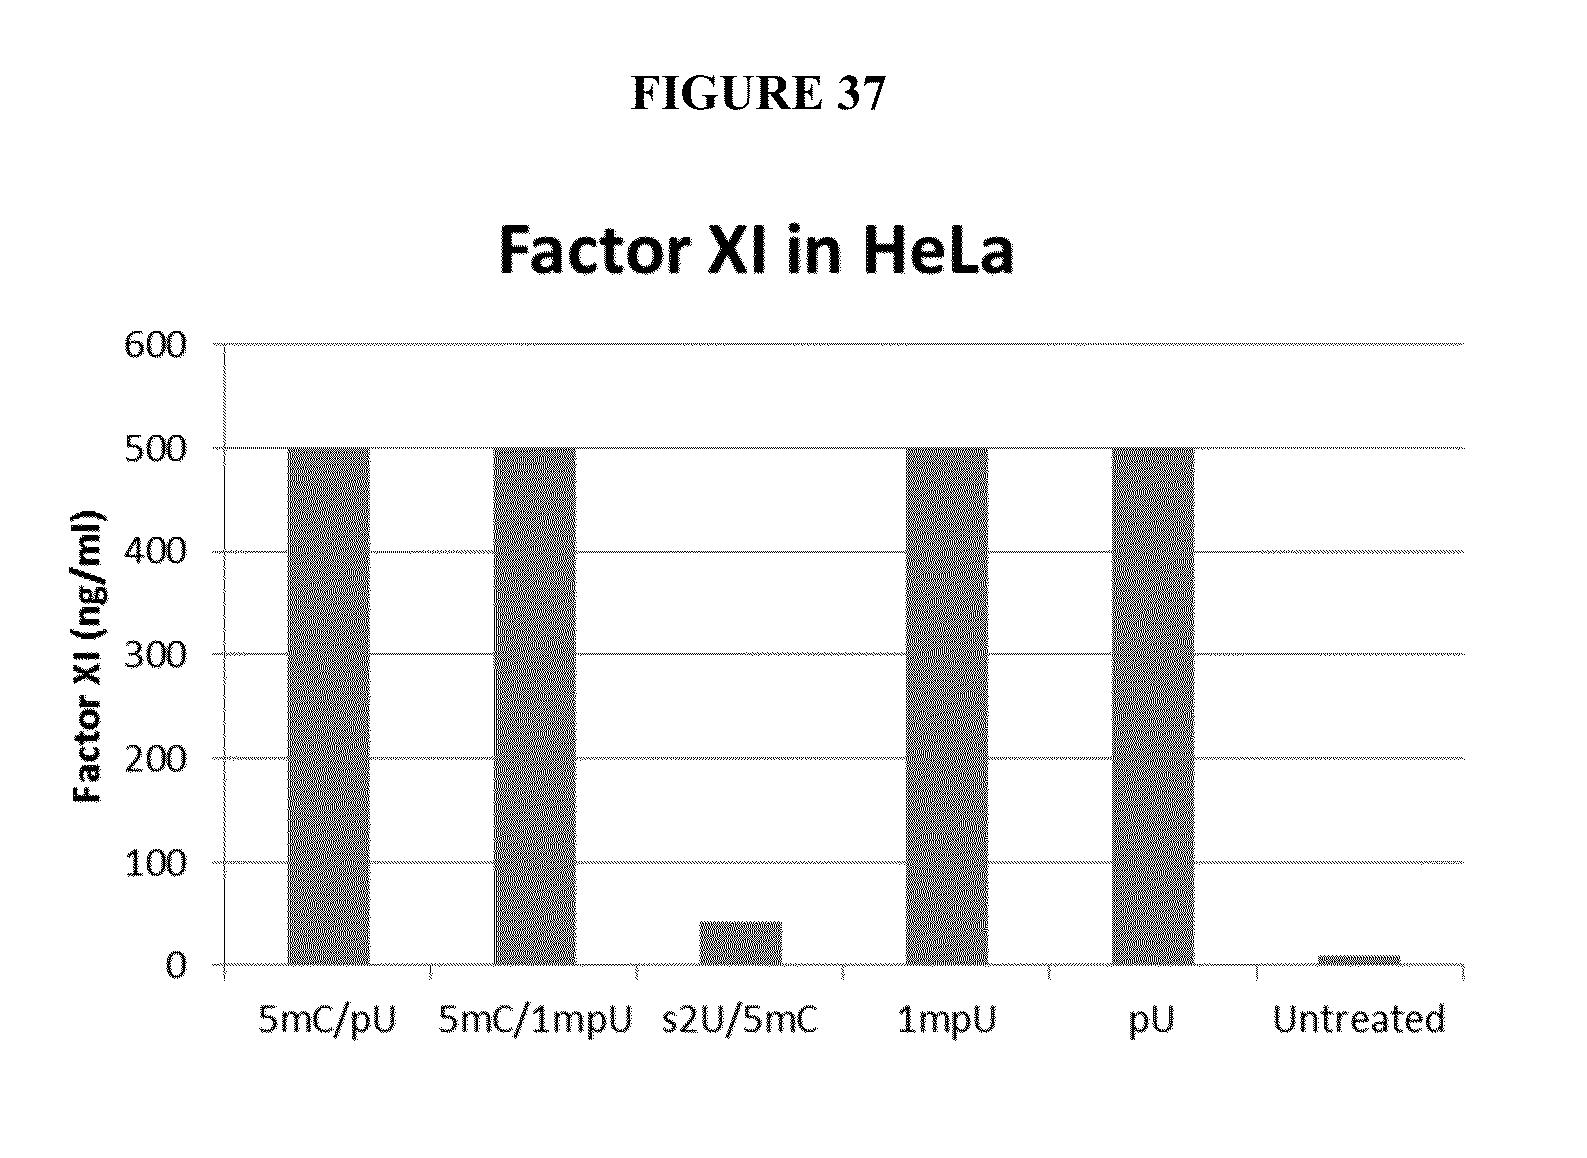 Patent US 9,107,886 B2